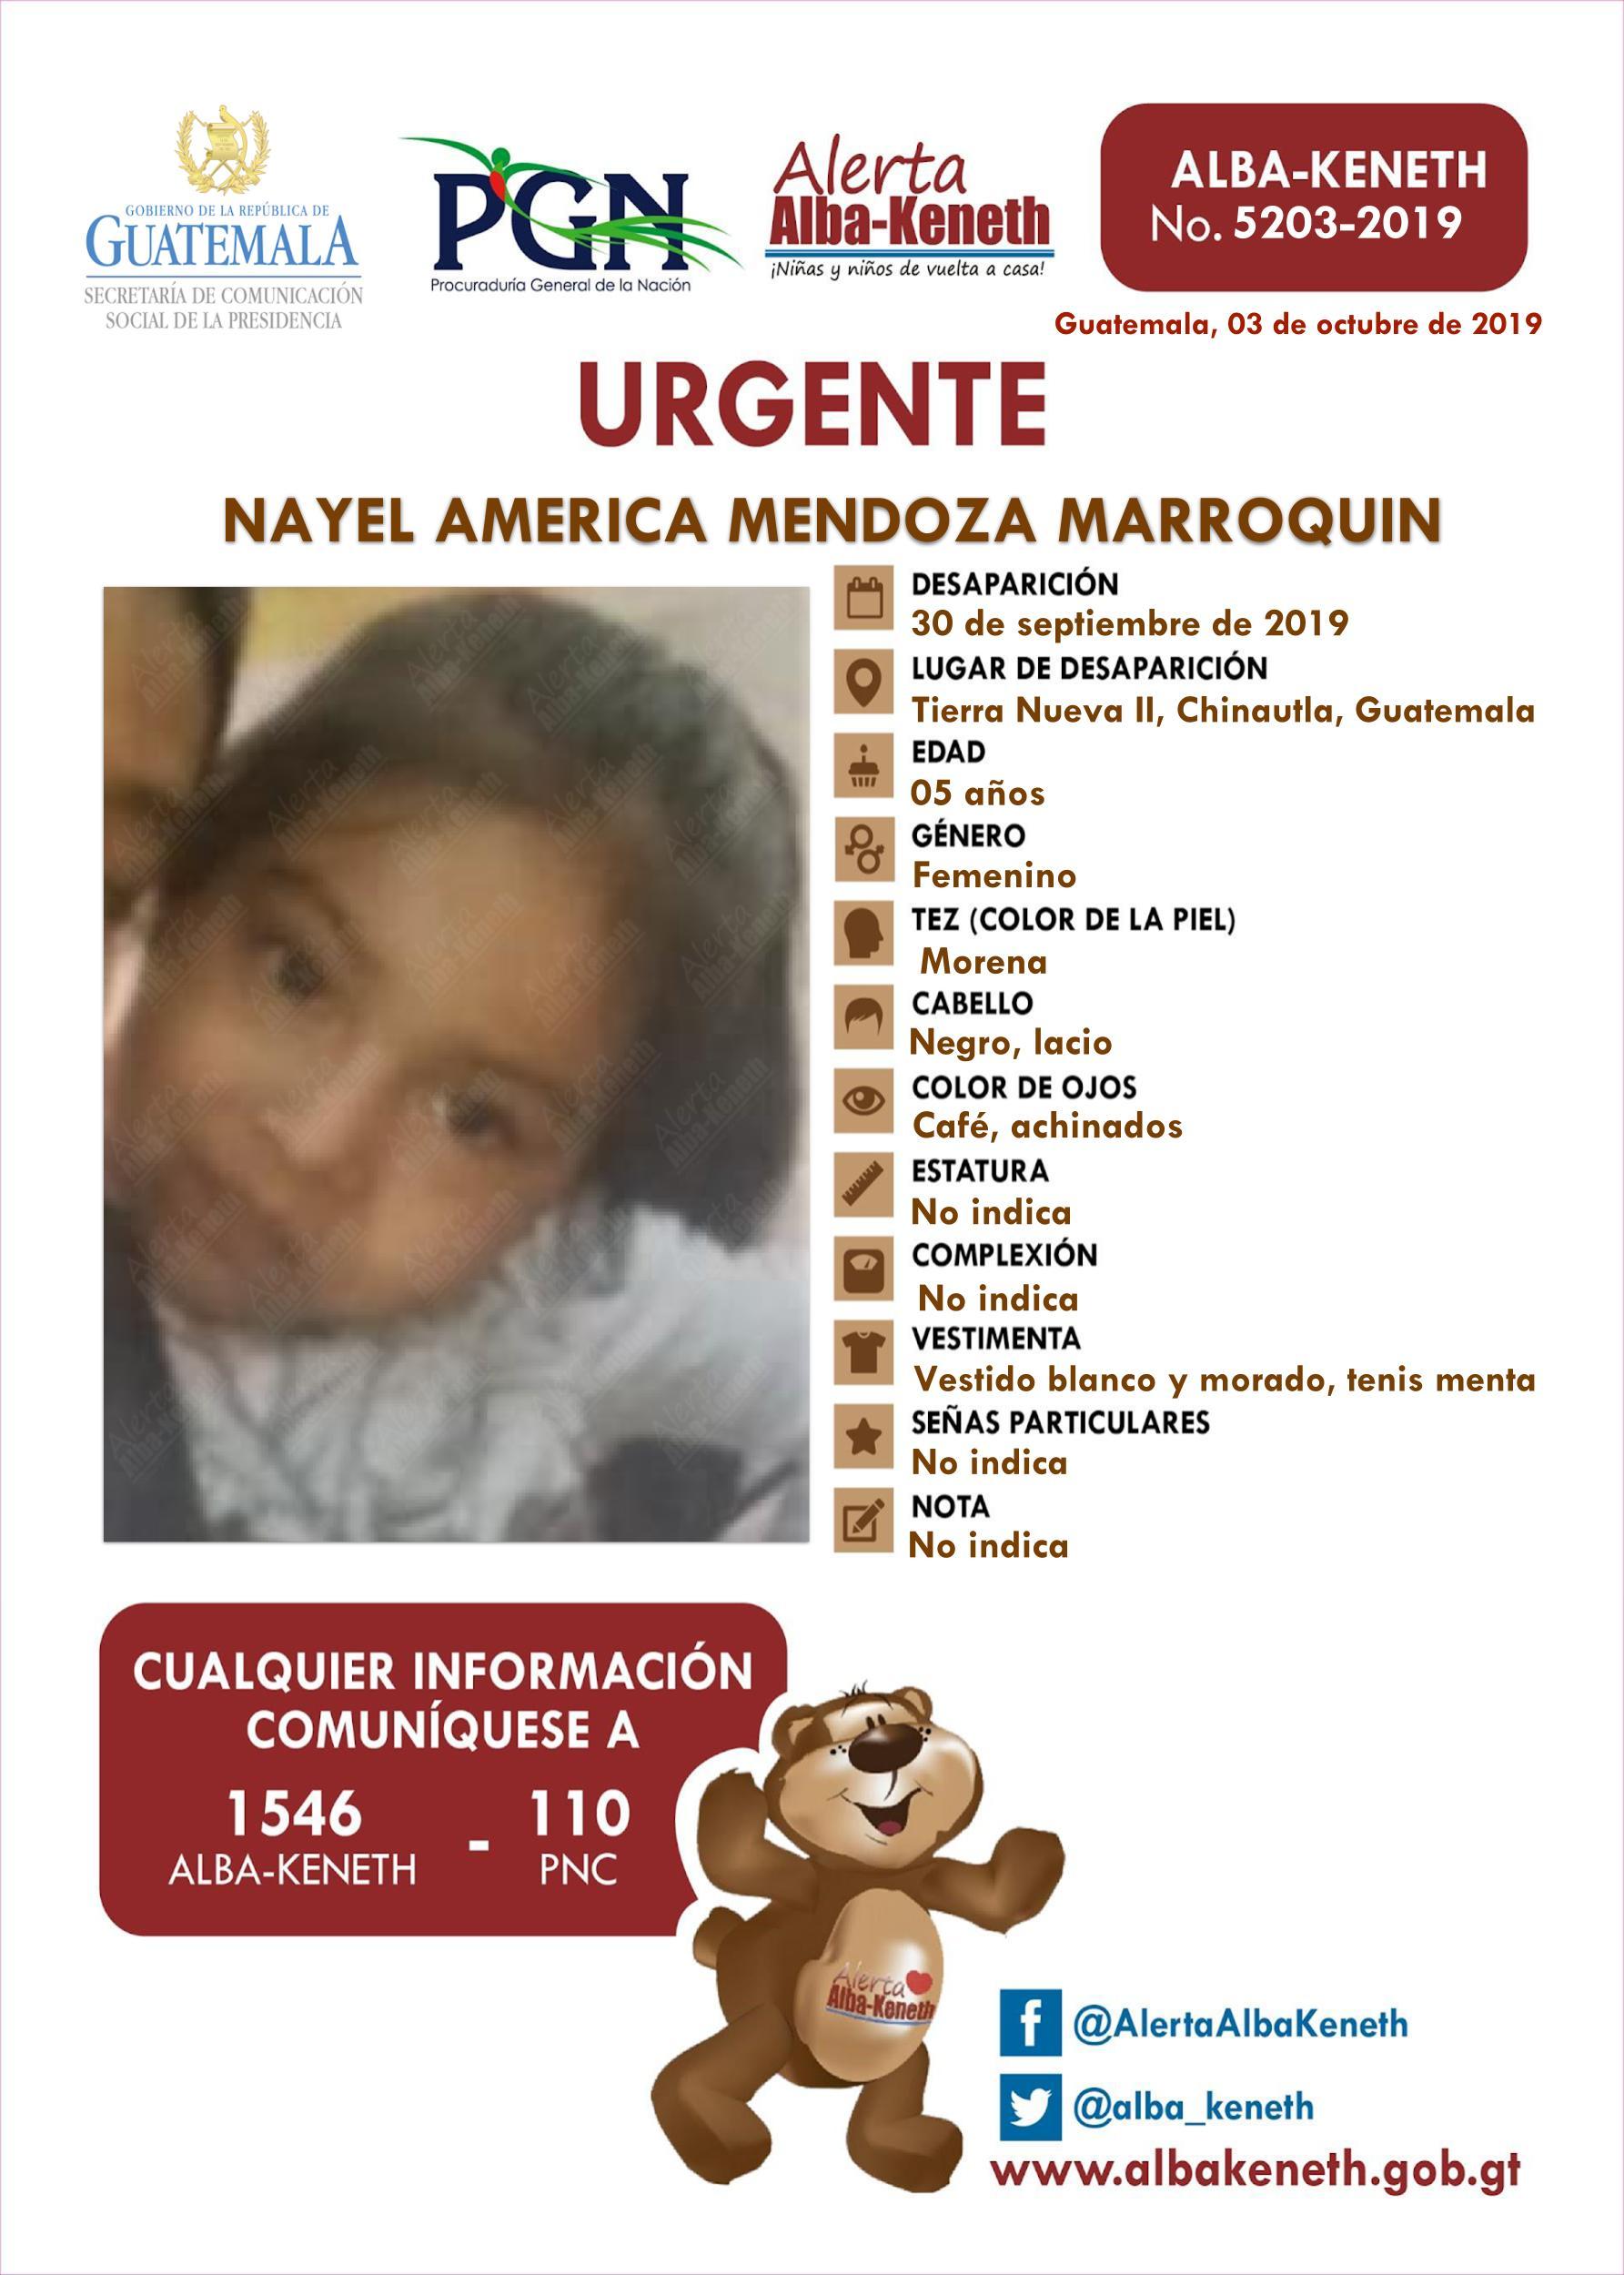 Nayel America Mendoza Marroquin